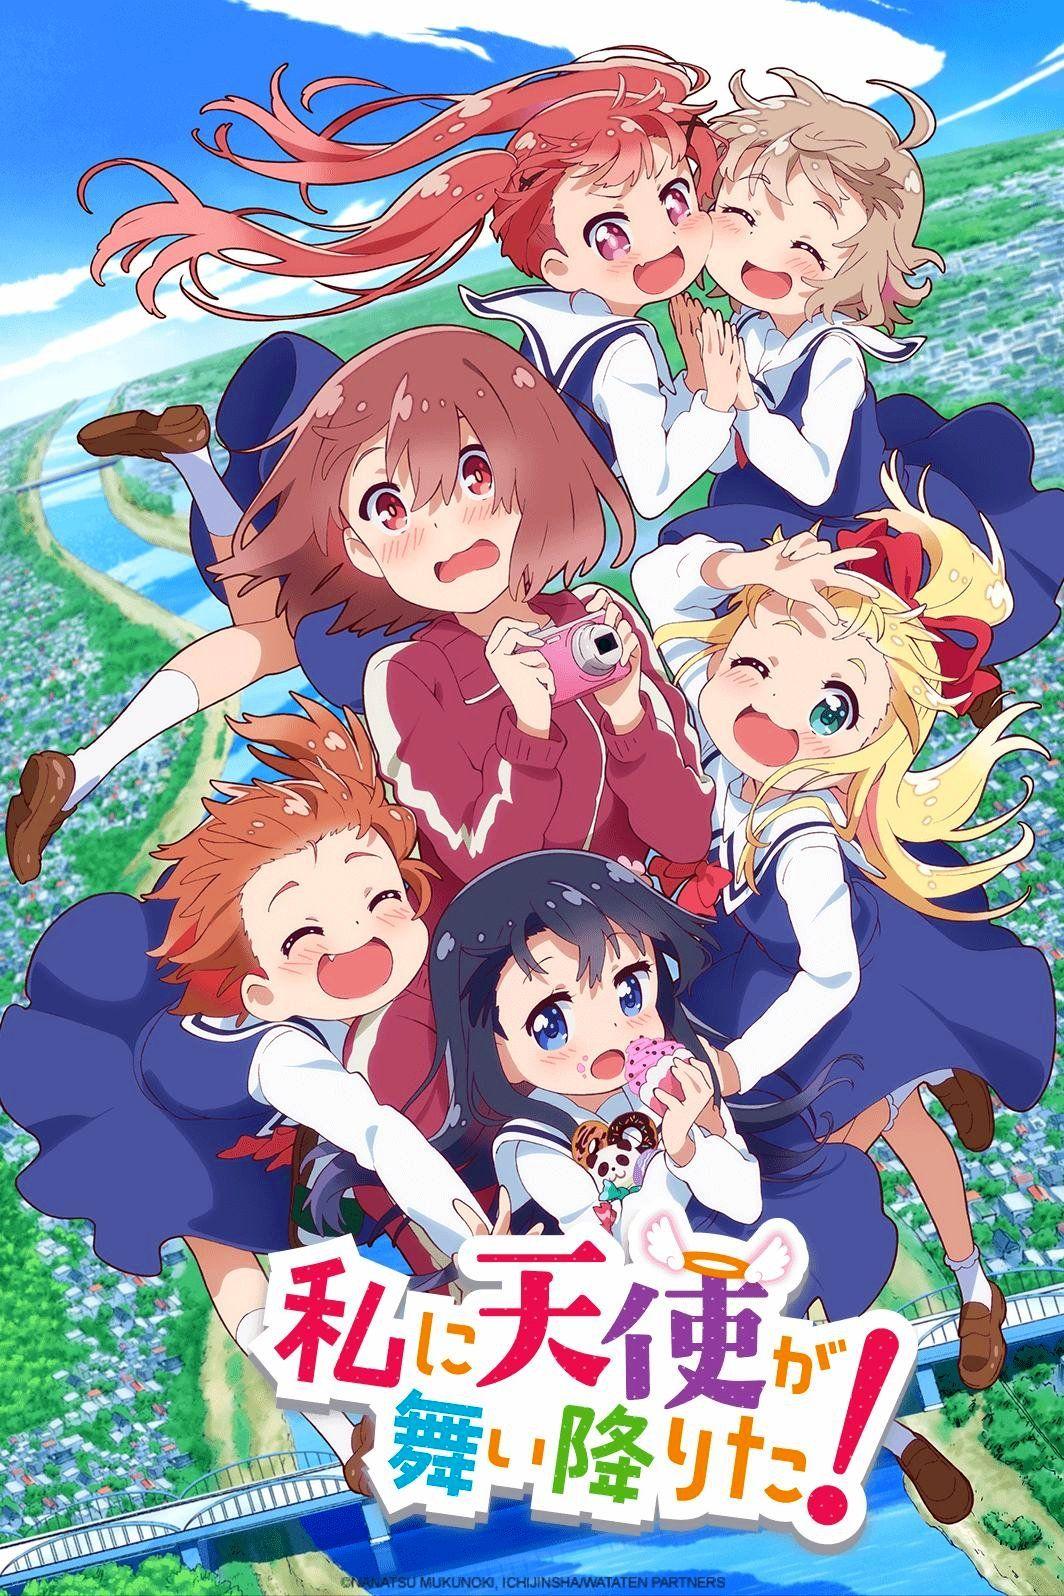 Pin on Anime Watchlist [01A]